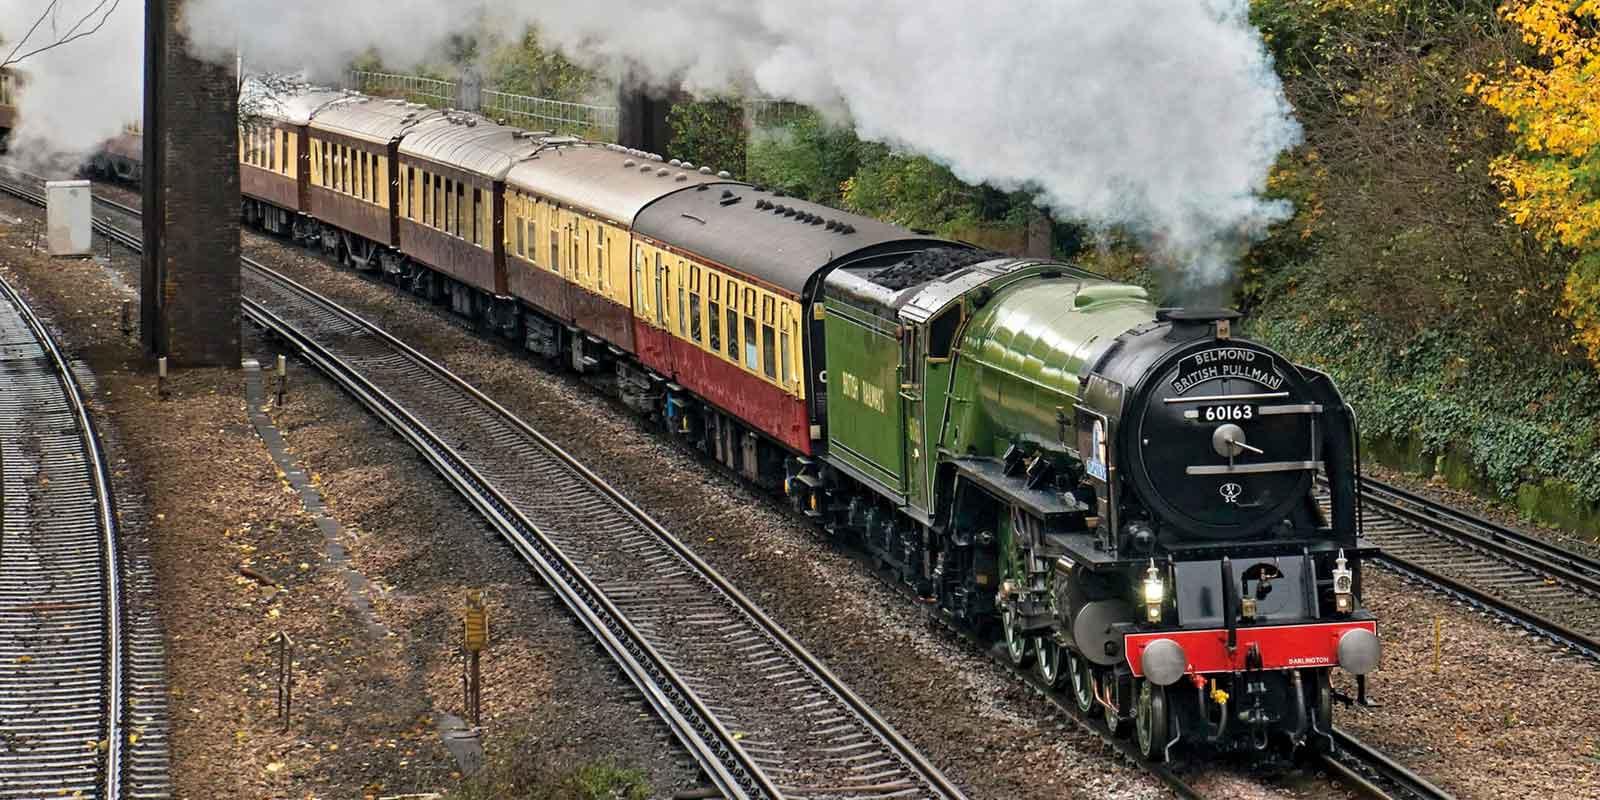 Stratford-Upon-Avon by Steam